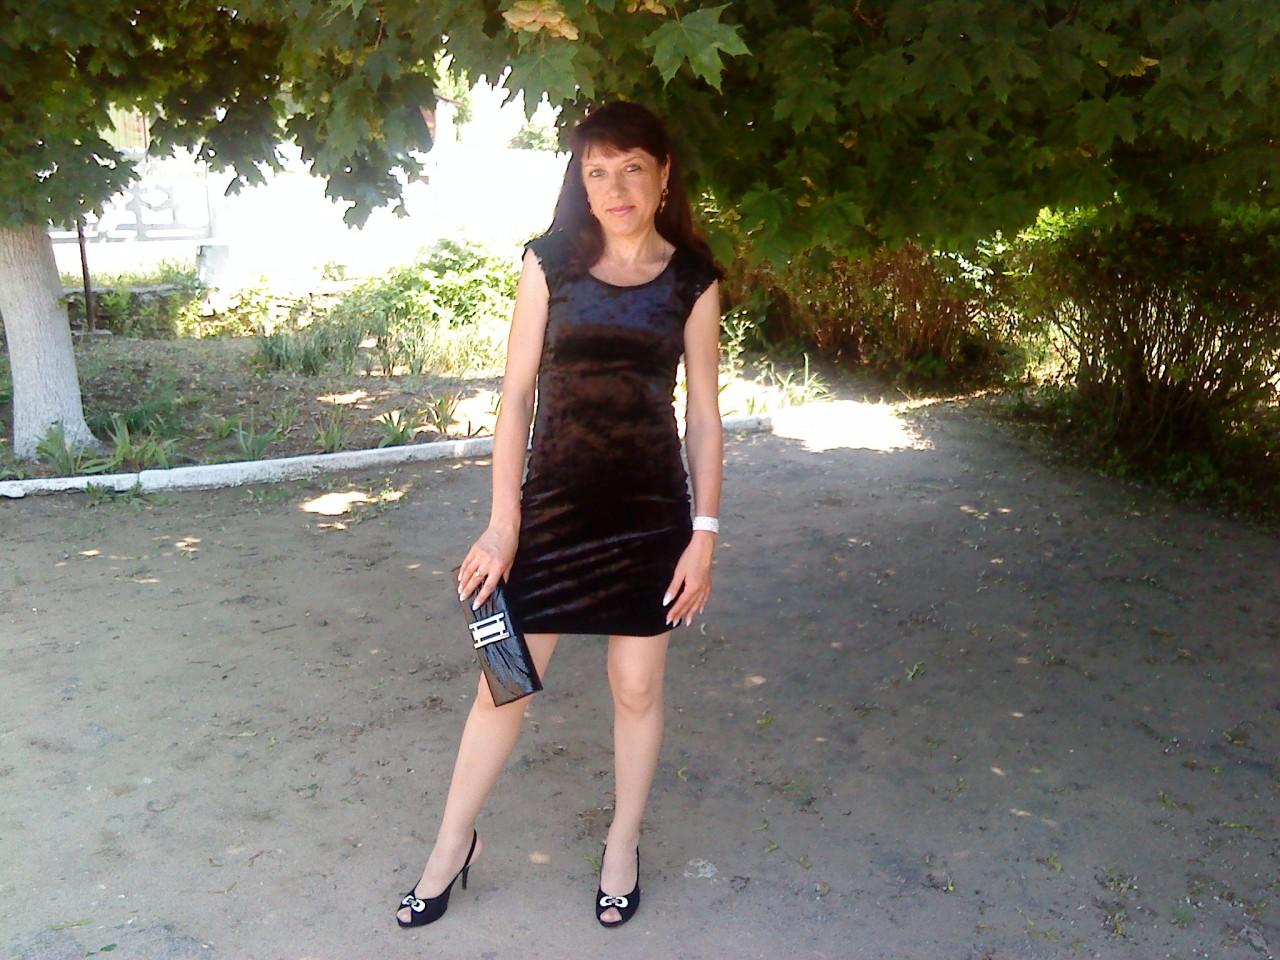 город сайт знакомств вознесенск